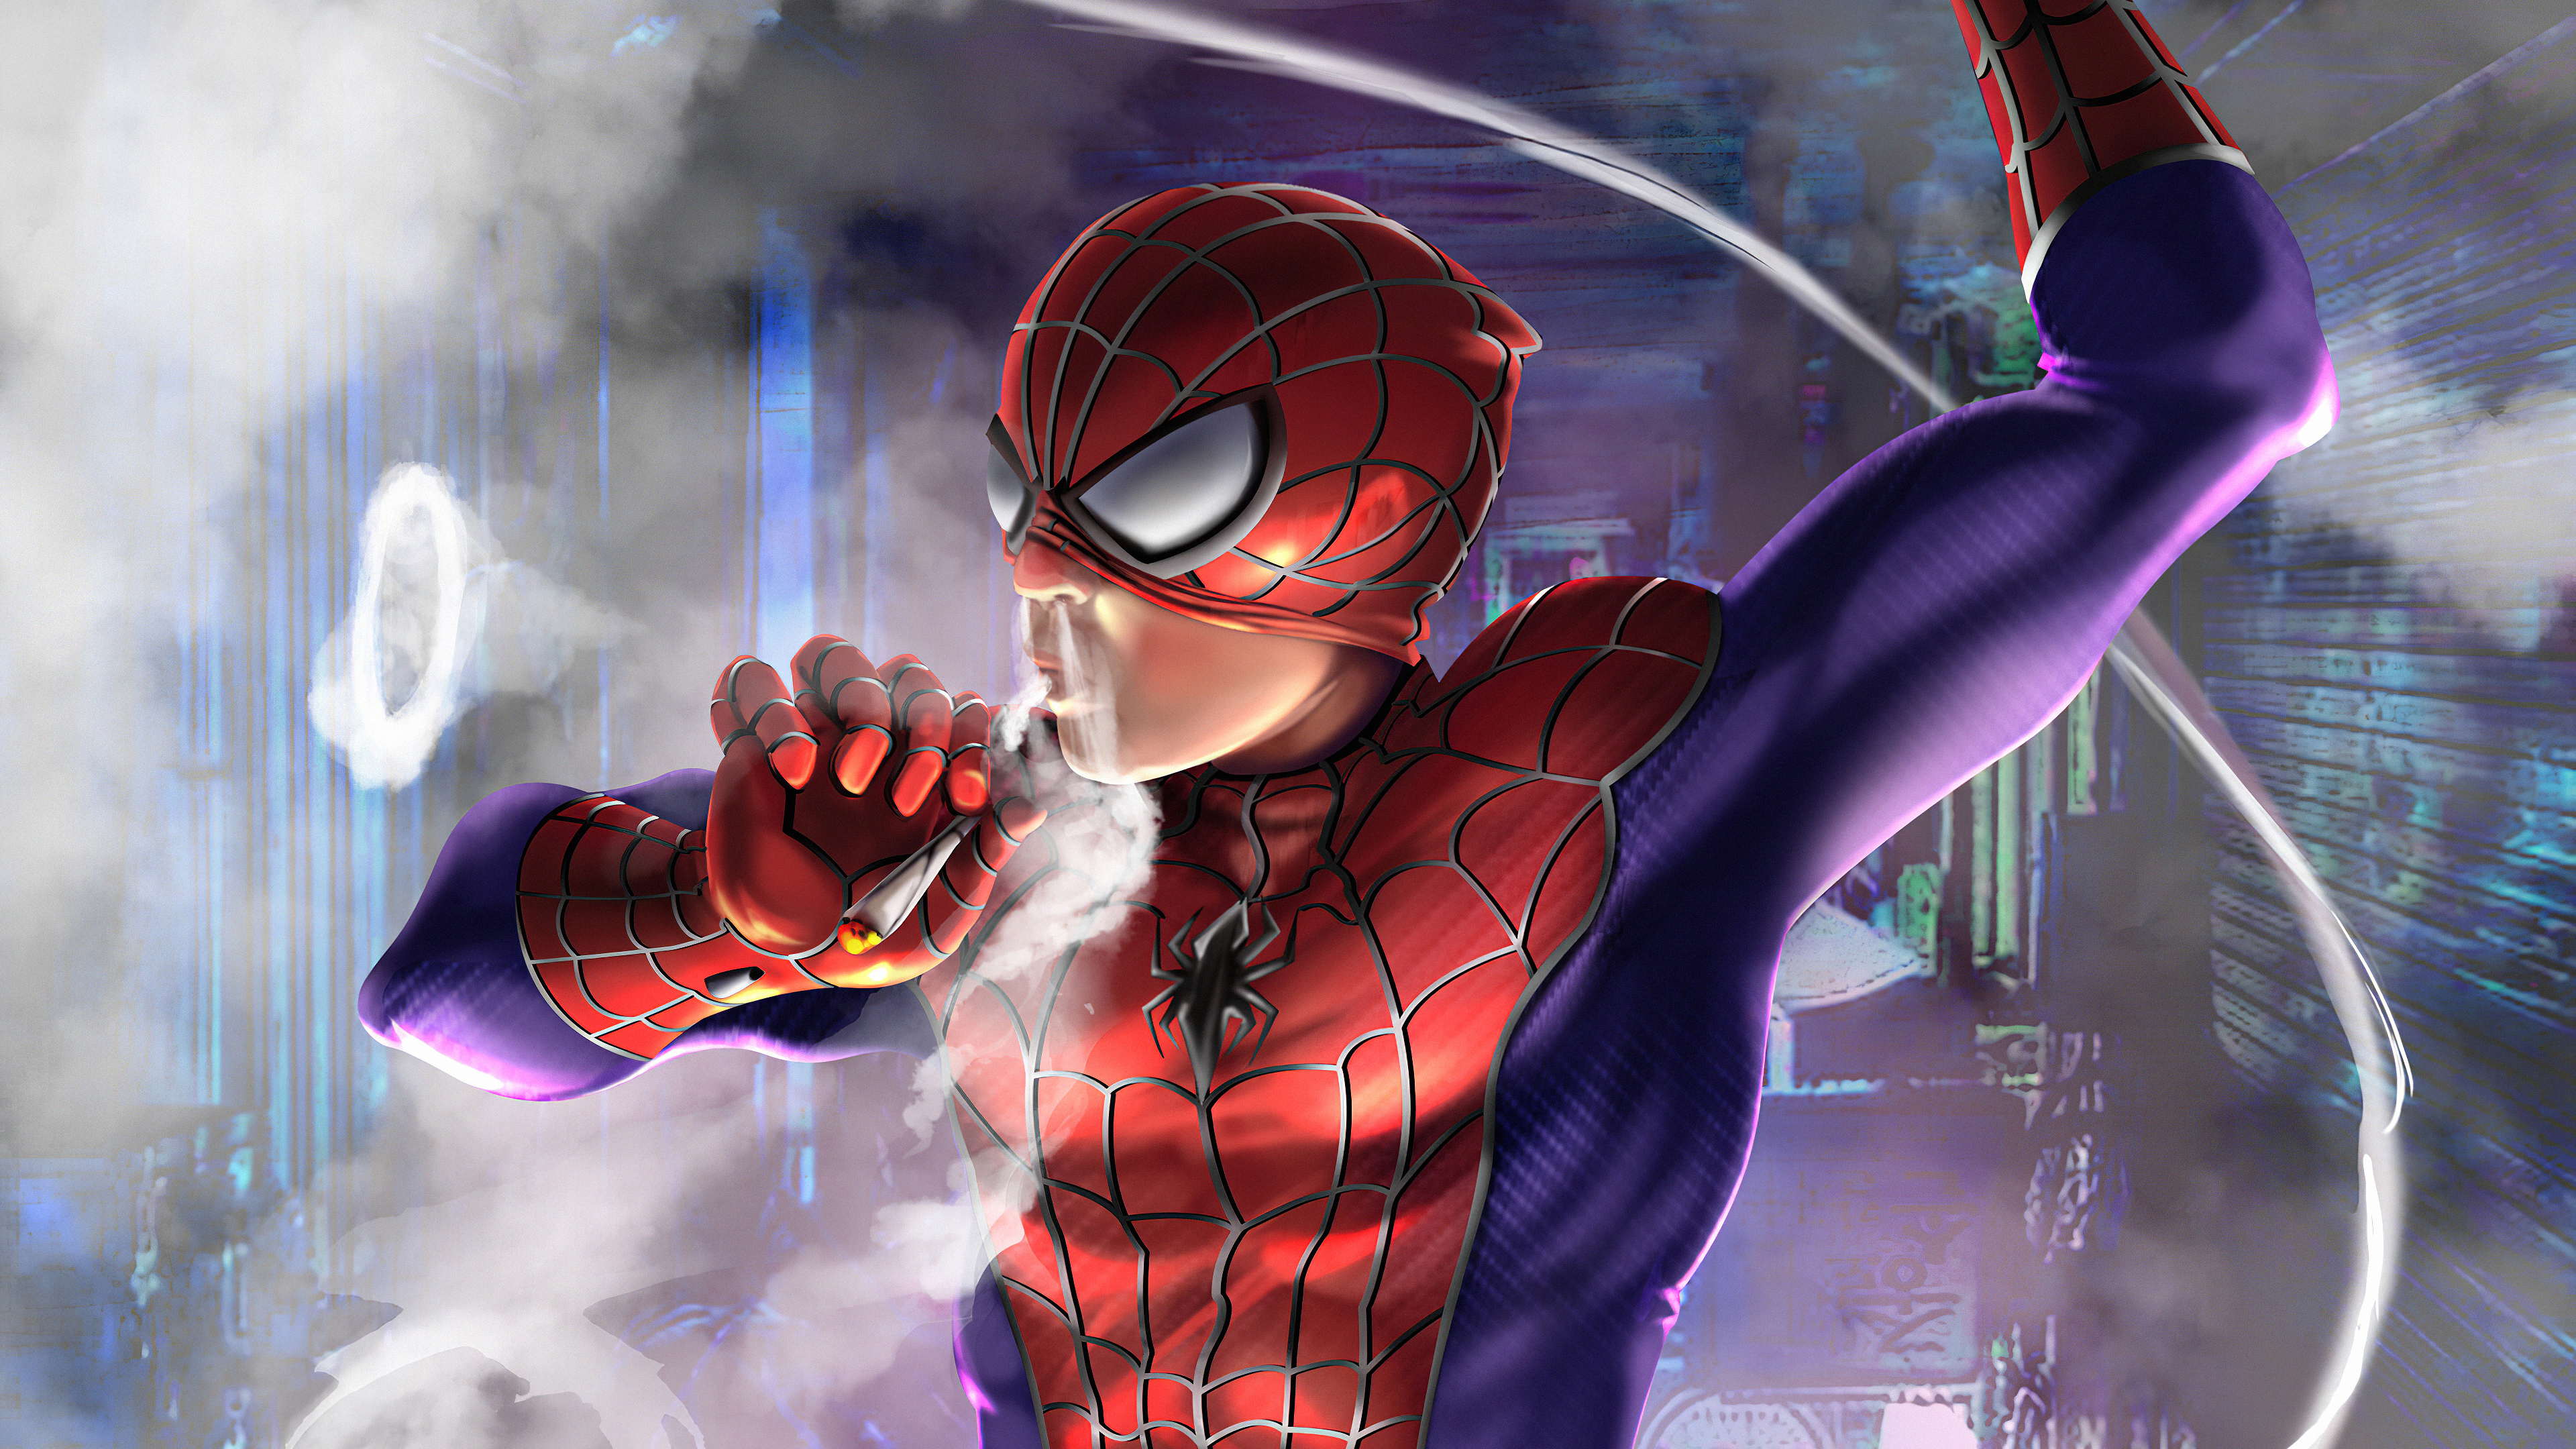 smoker spiderman art 1576091226 - Smoker Spiderman art - Spiderman Smoker wallpaper hd 4k, Smoker spiderman 4k wallpaper